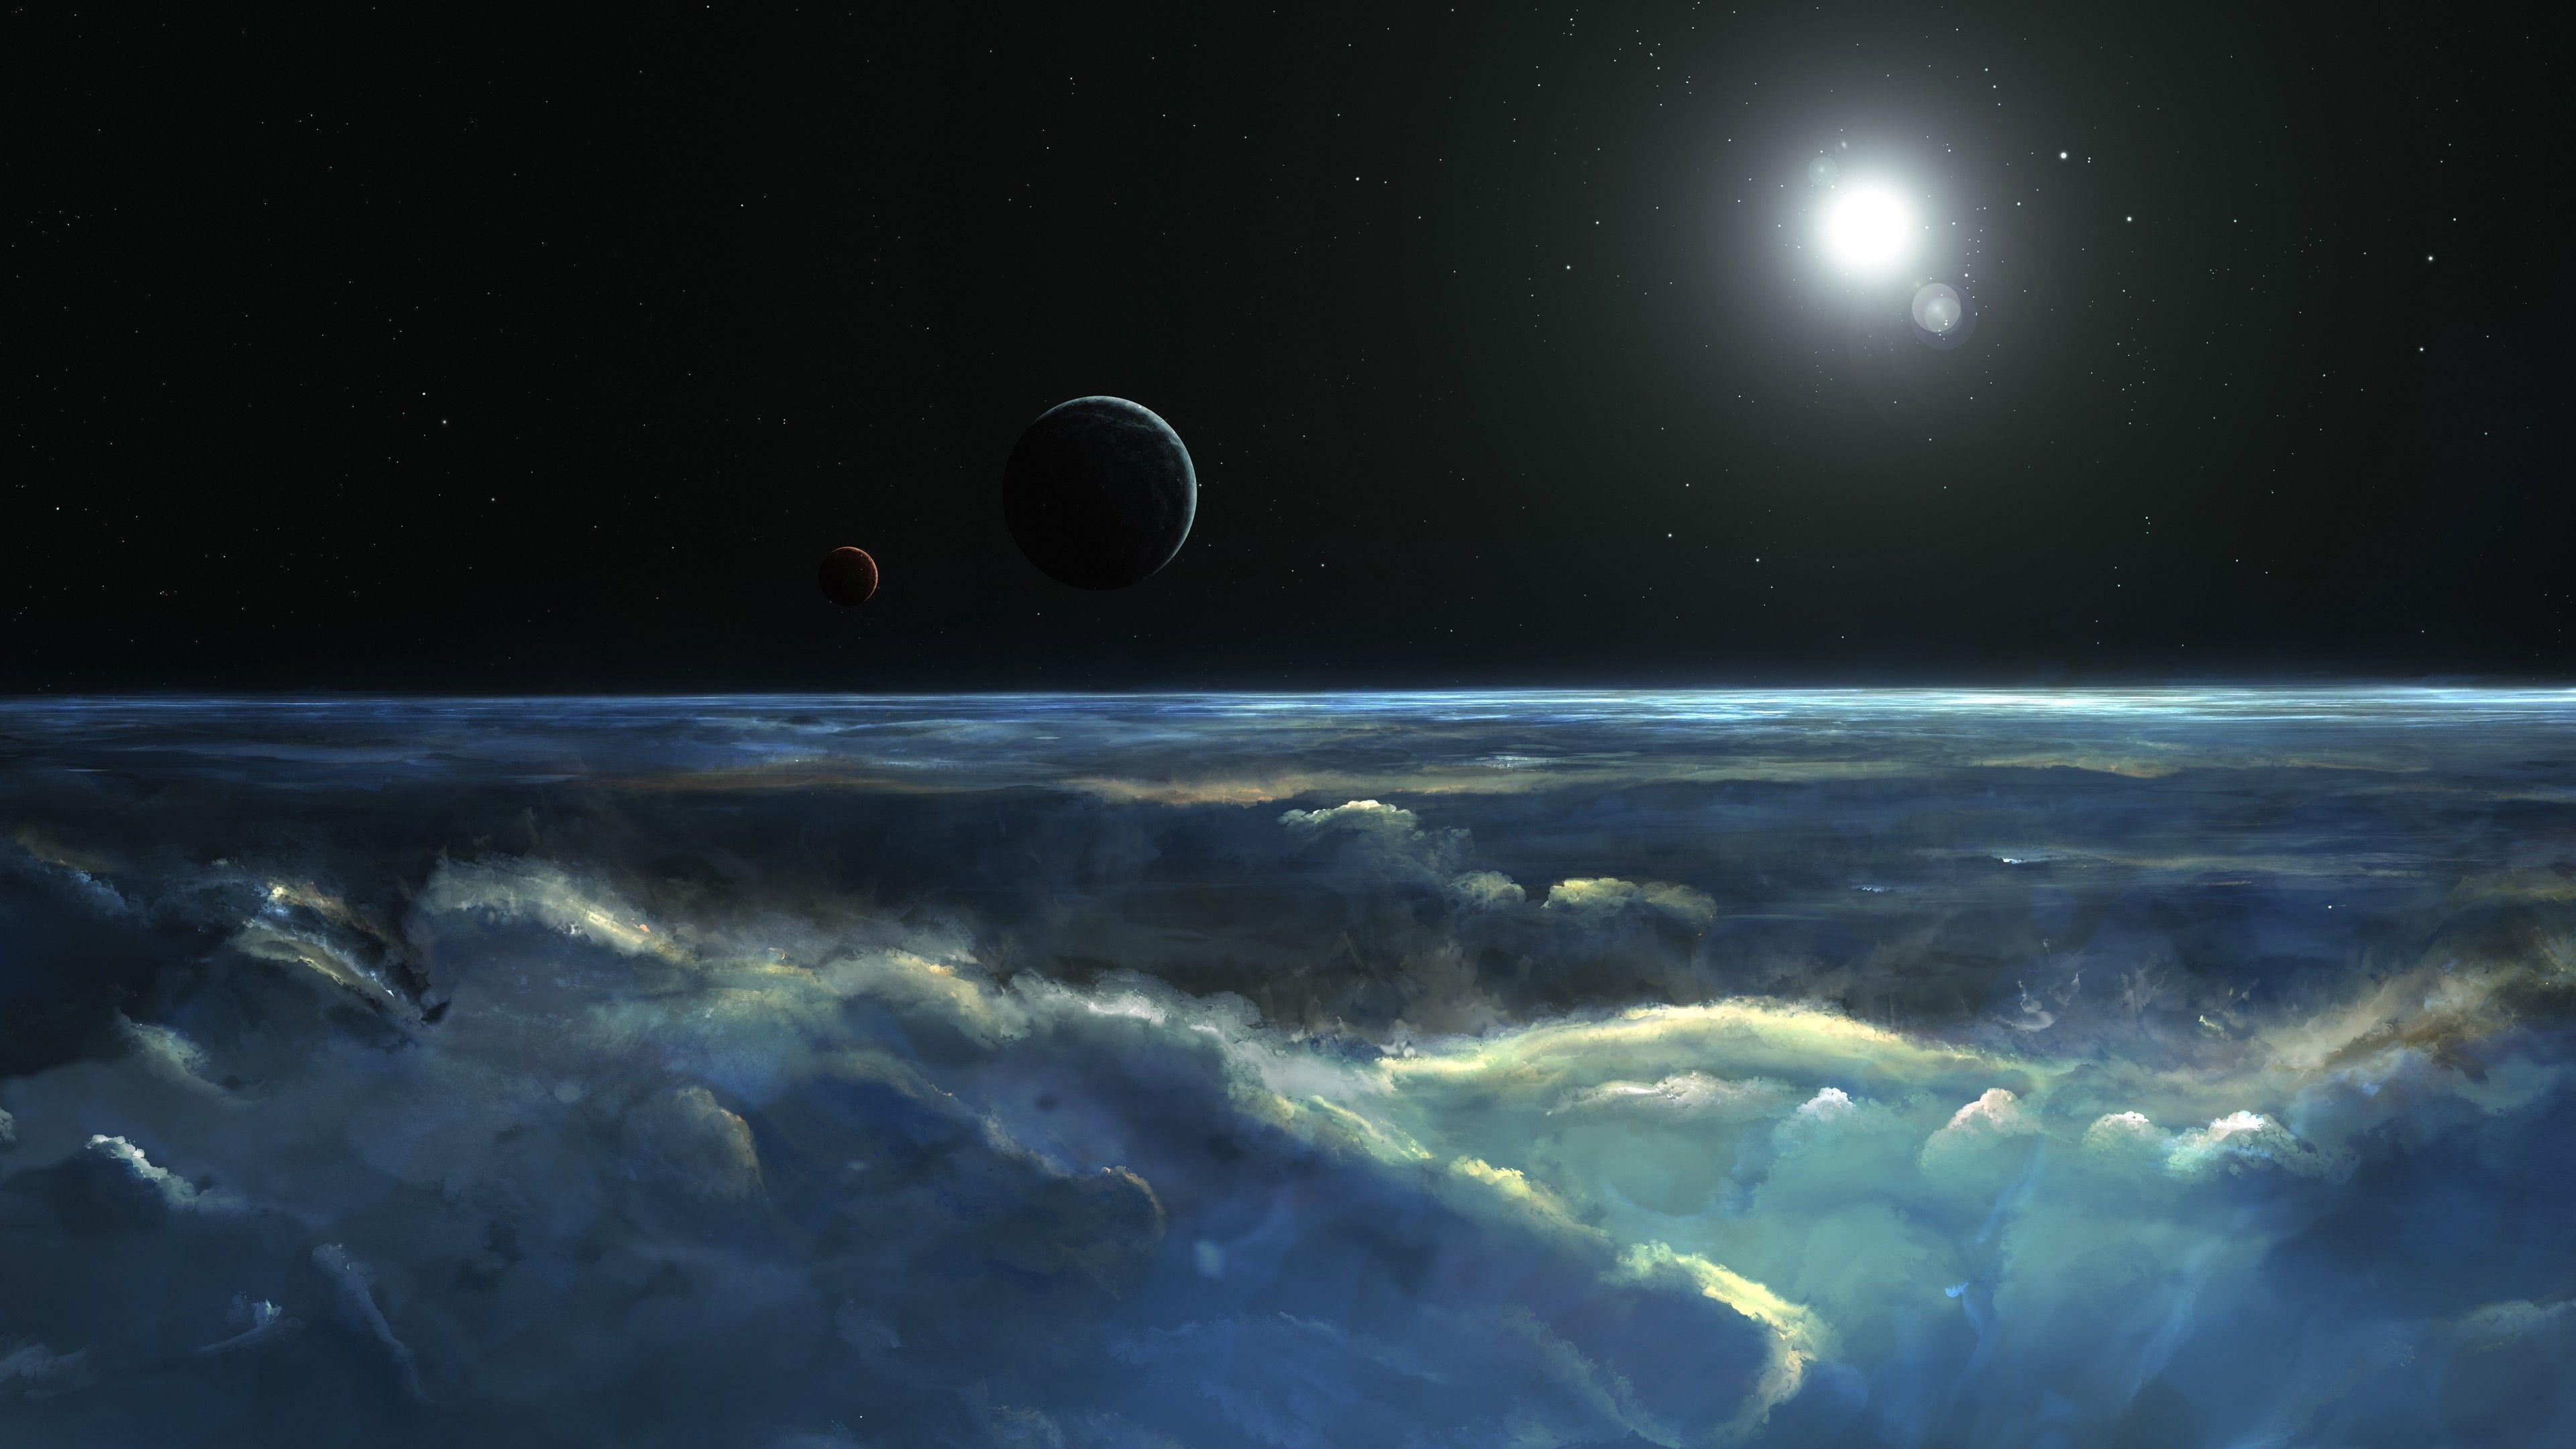 Earth Stormy Atmosphere 4k Wallpaper